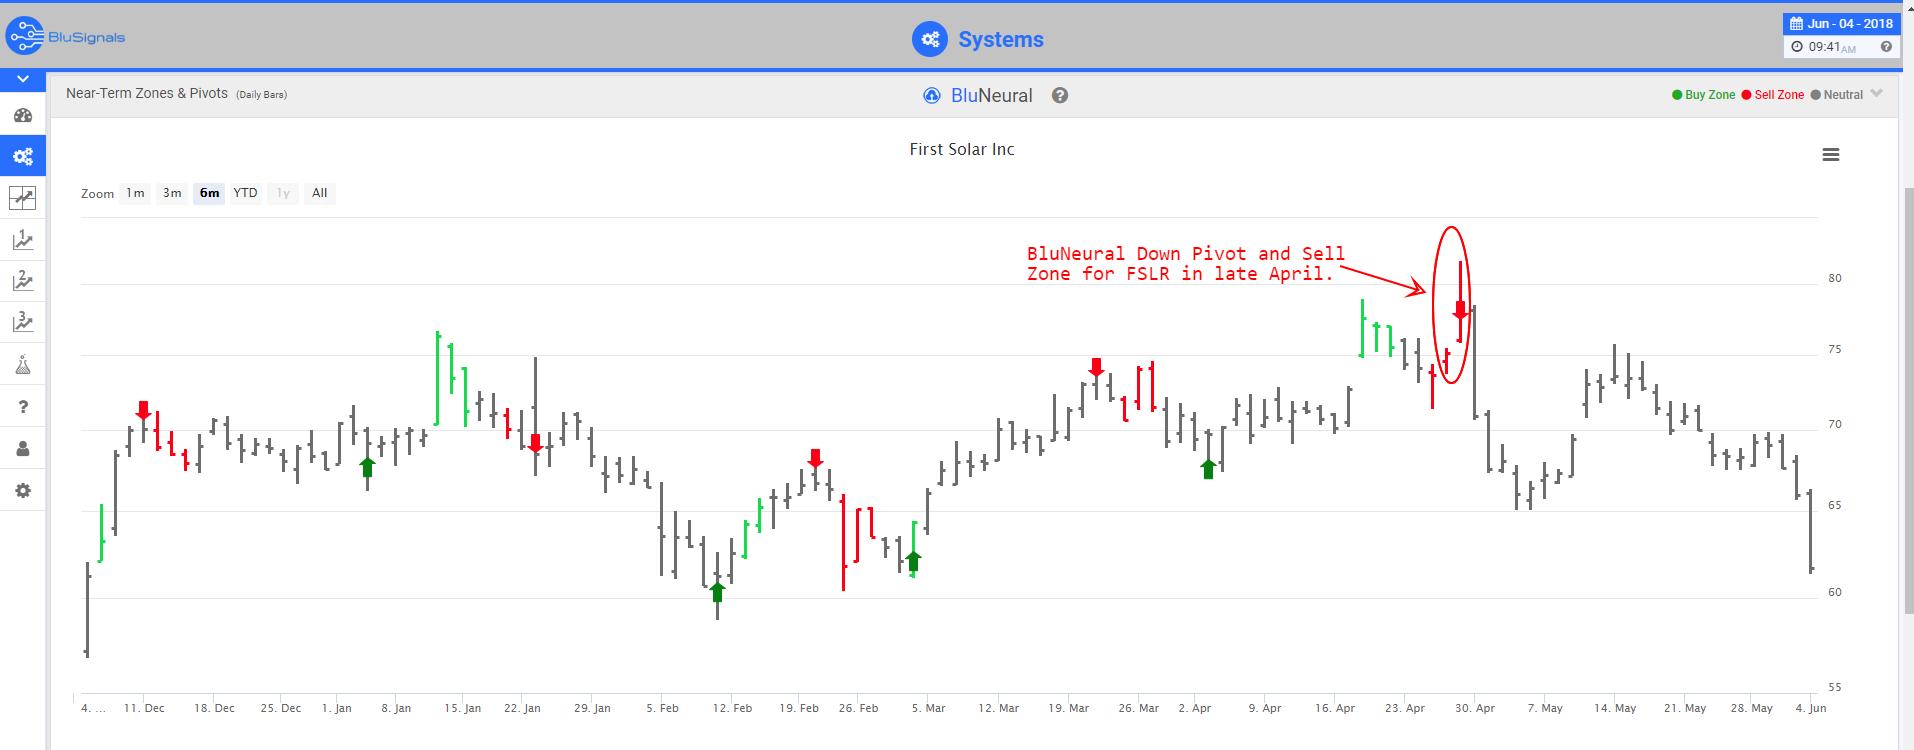 KSLR Trading Signals